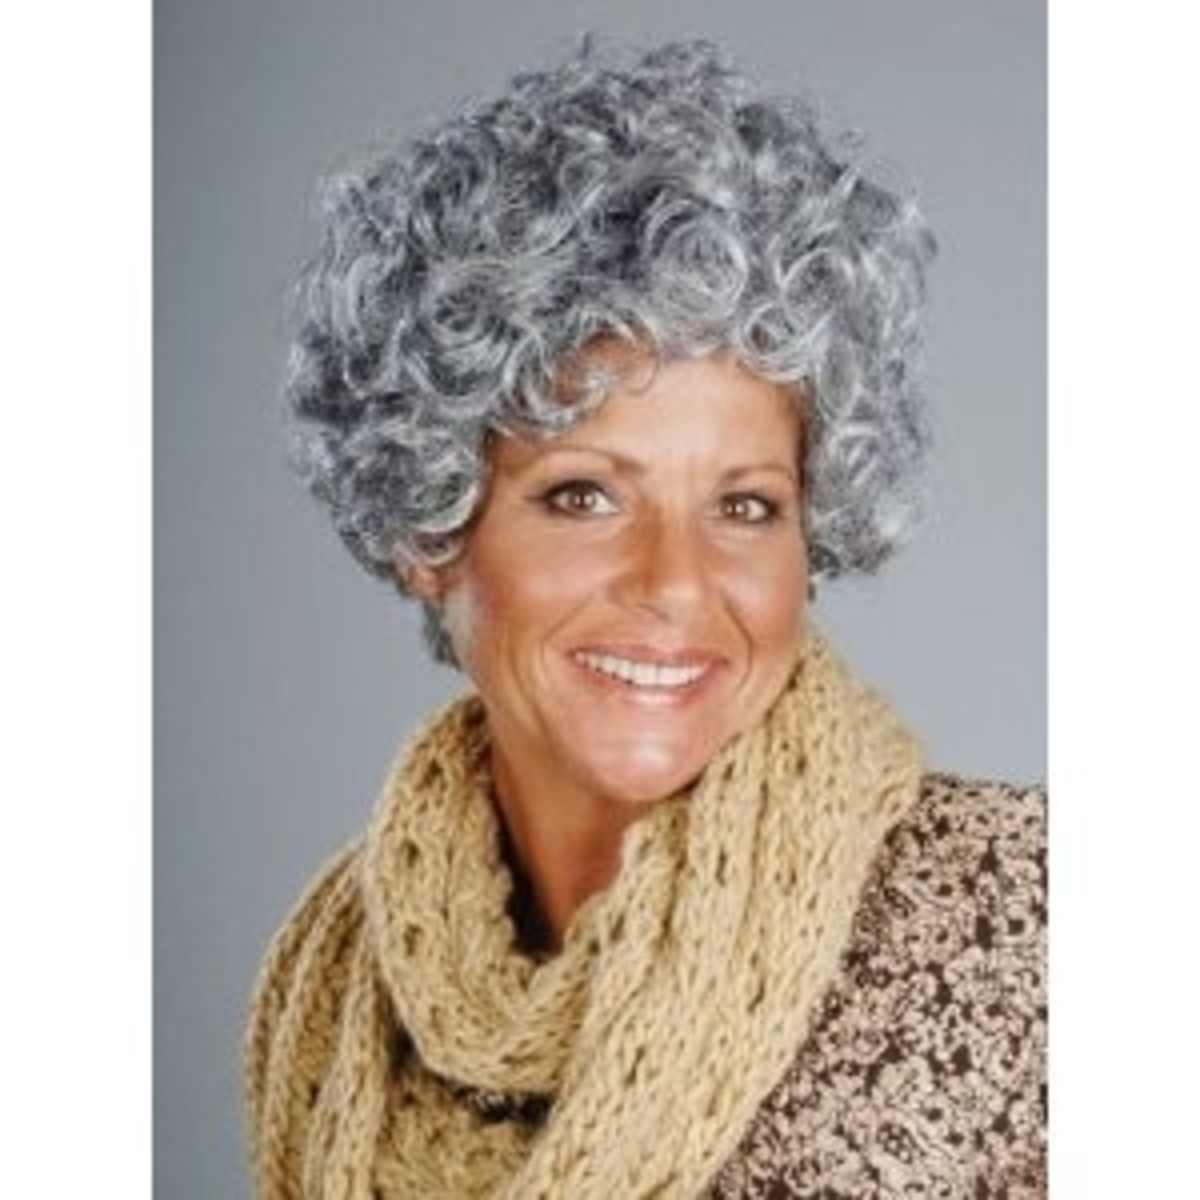 A simple Nanna Grandma grey wig works, too.